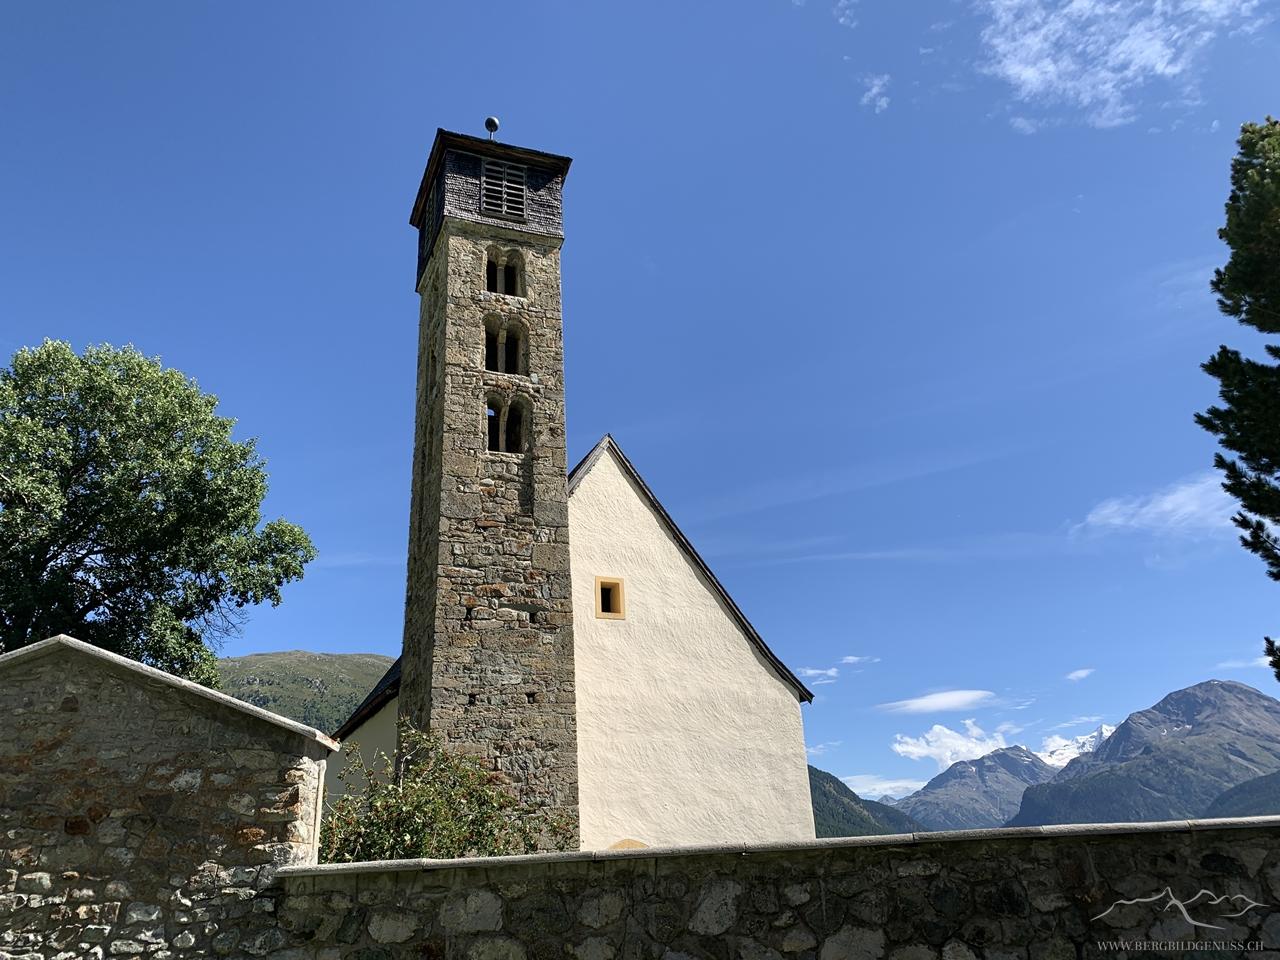 San Gian oberhalb von Samedan